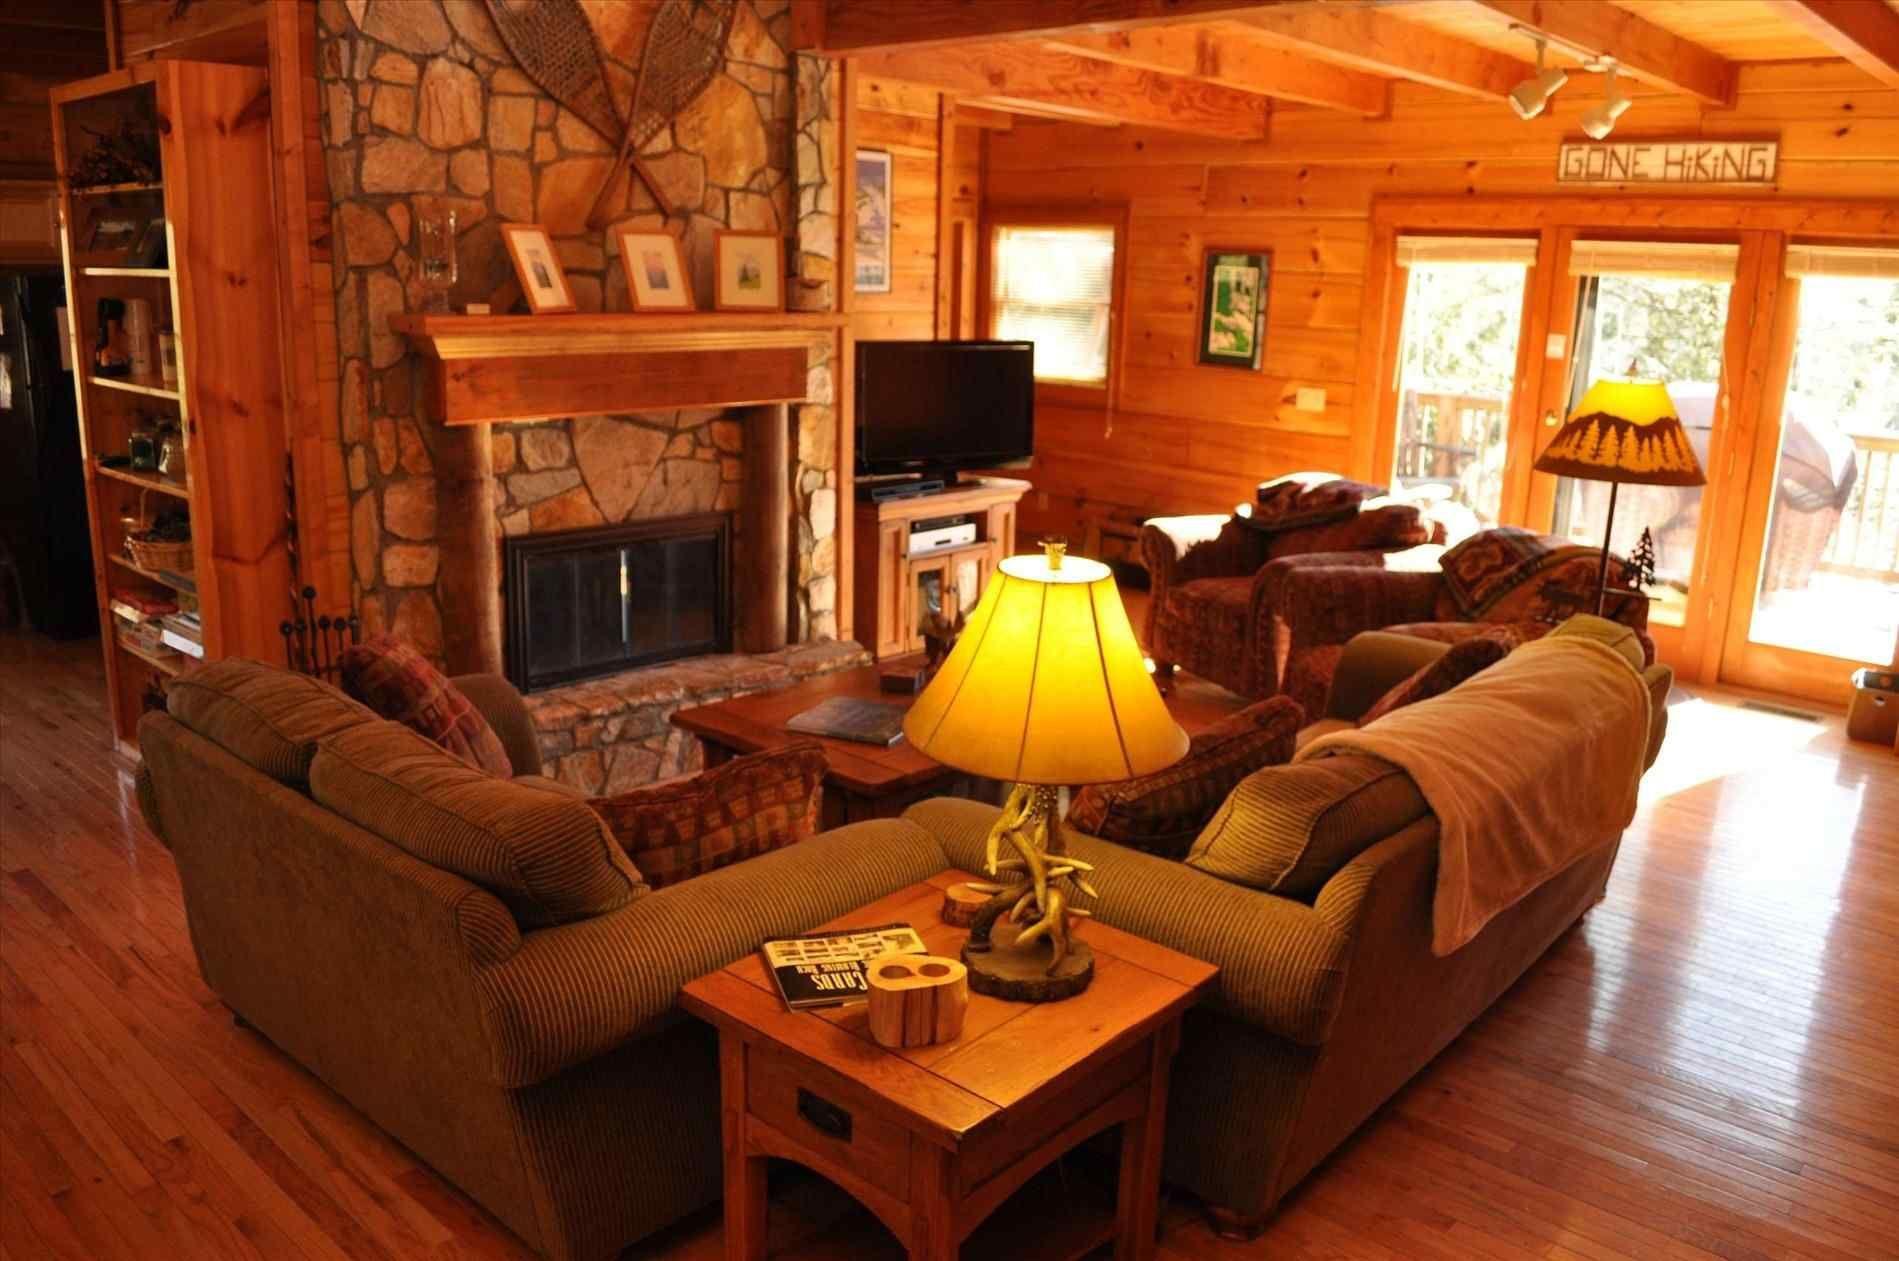 furniture in home villazbeats log living com room ideas cabins application decorating decor cabin the